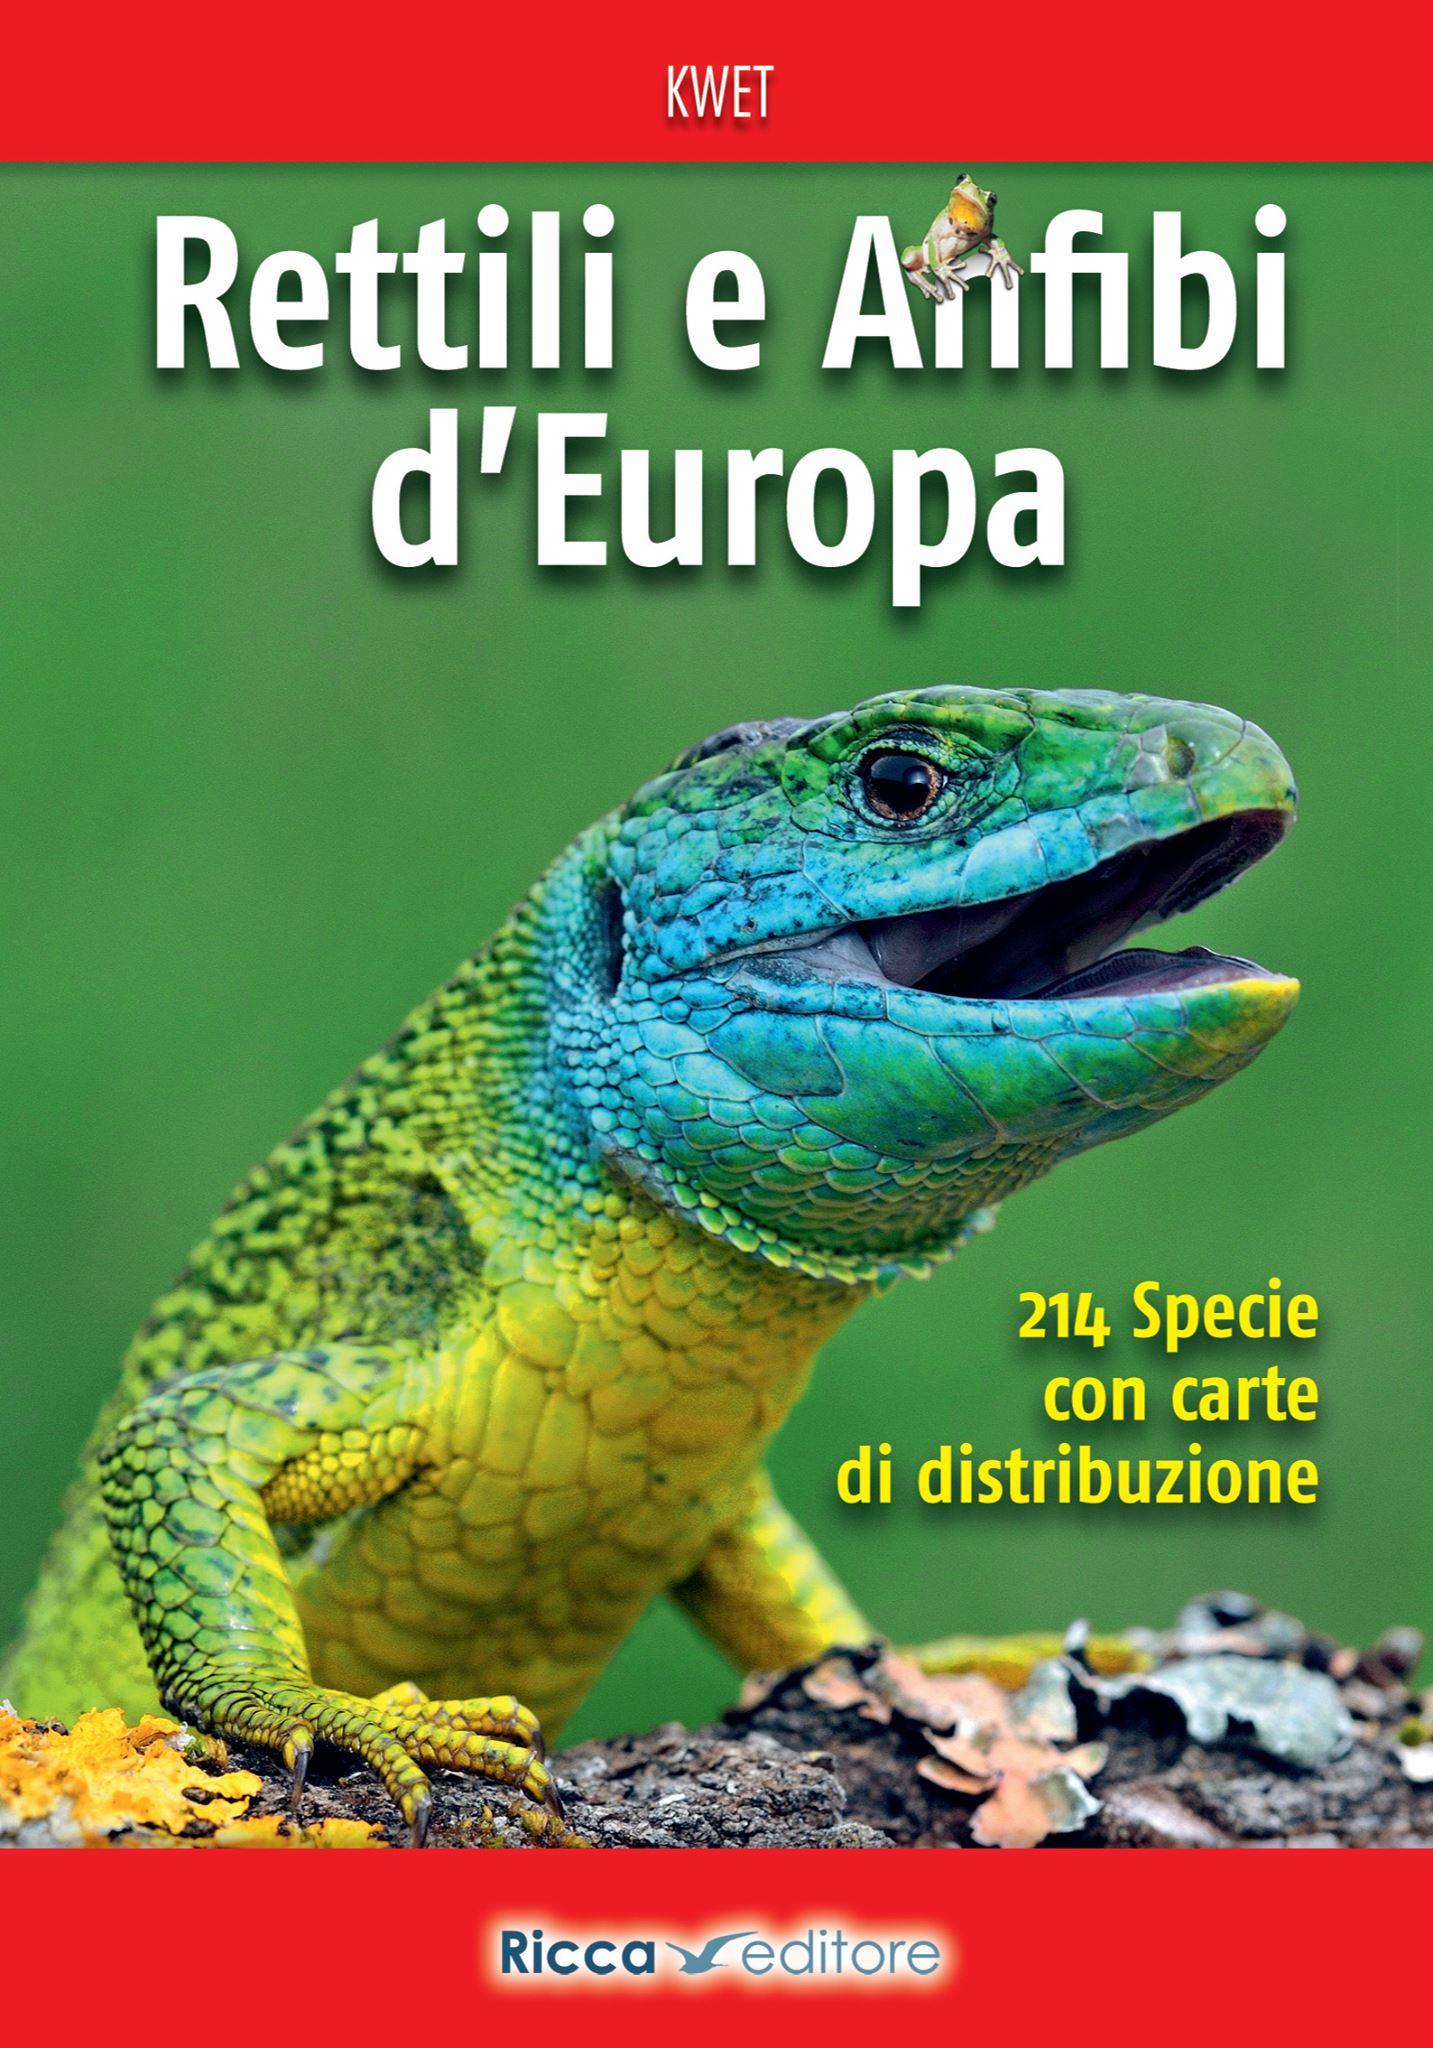 Rettili e Anfibi d'Europa. Axel Kwet. Ricca Editore.